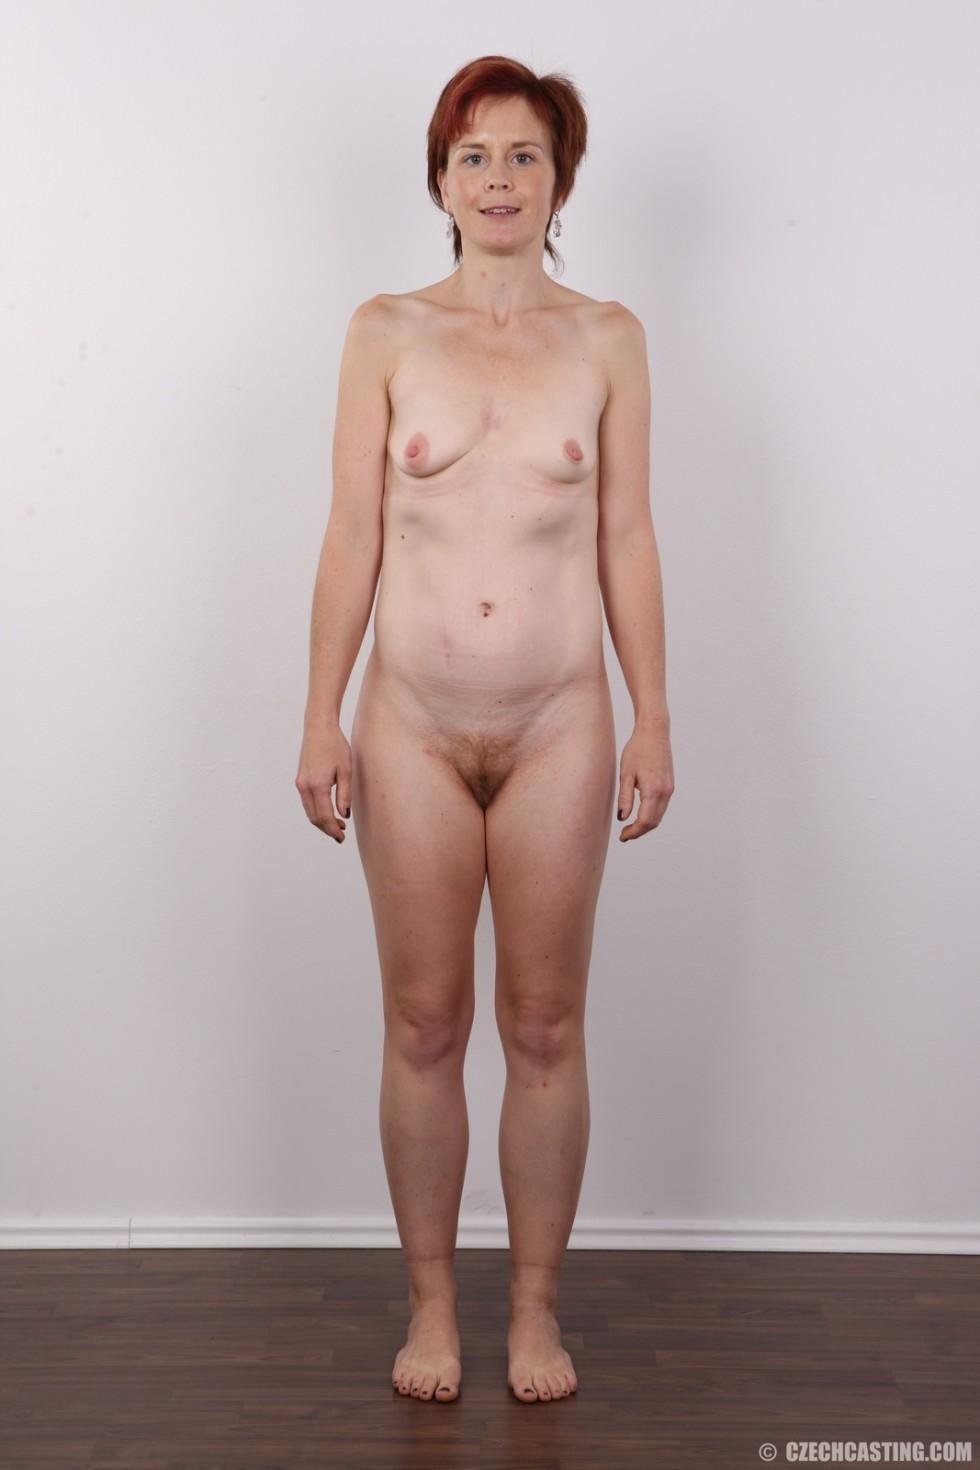 Reverse cow girl ebony porno